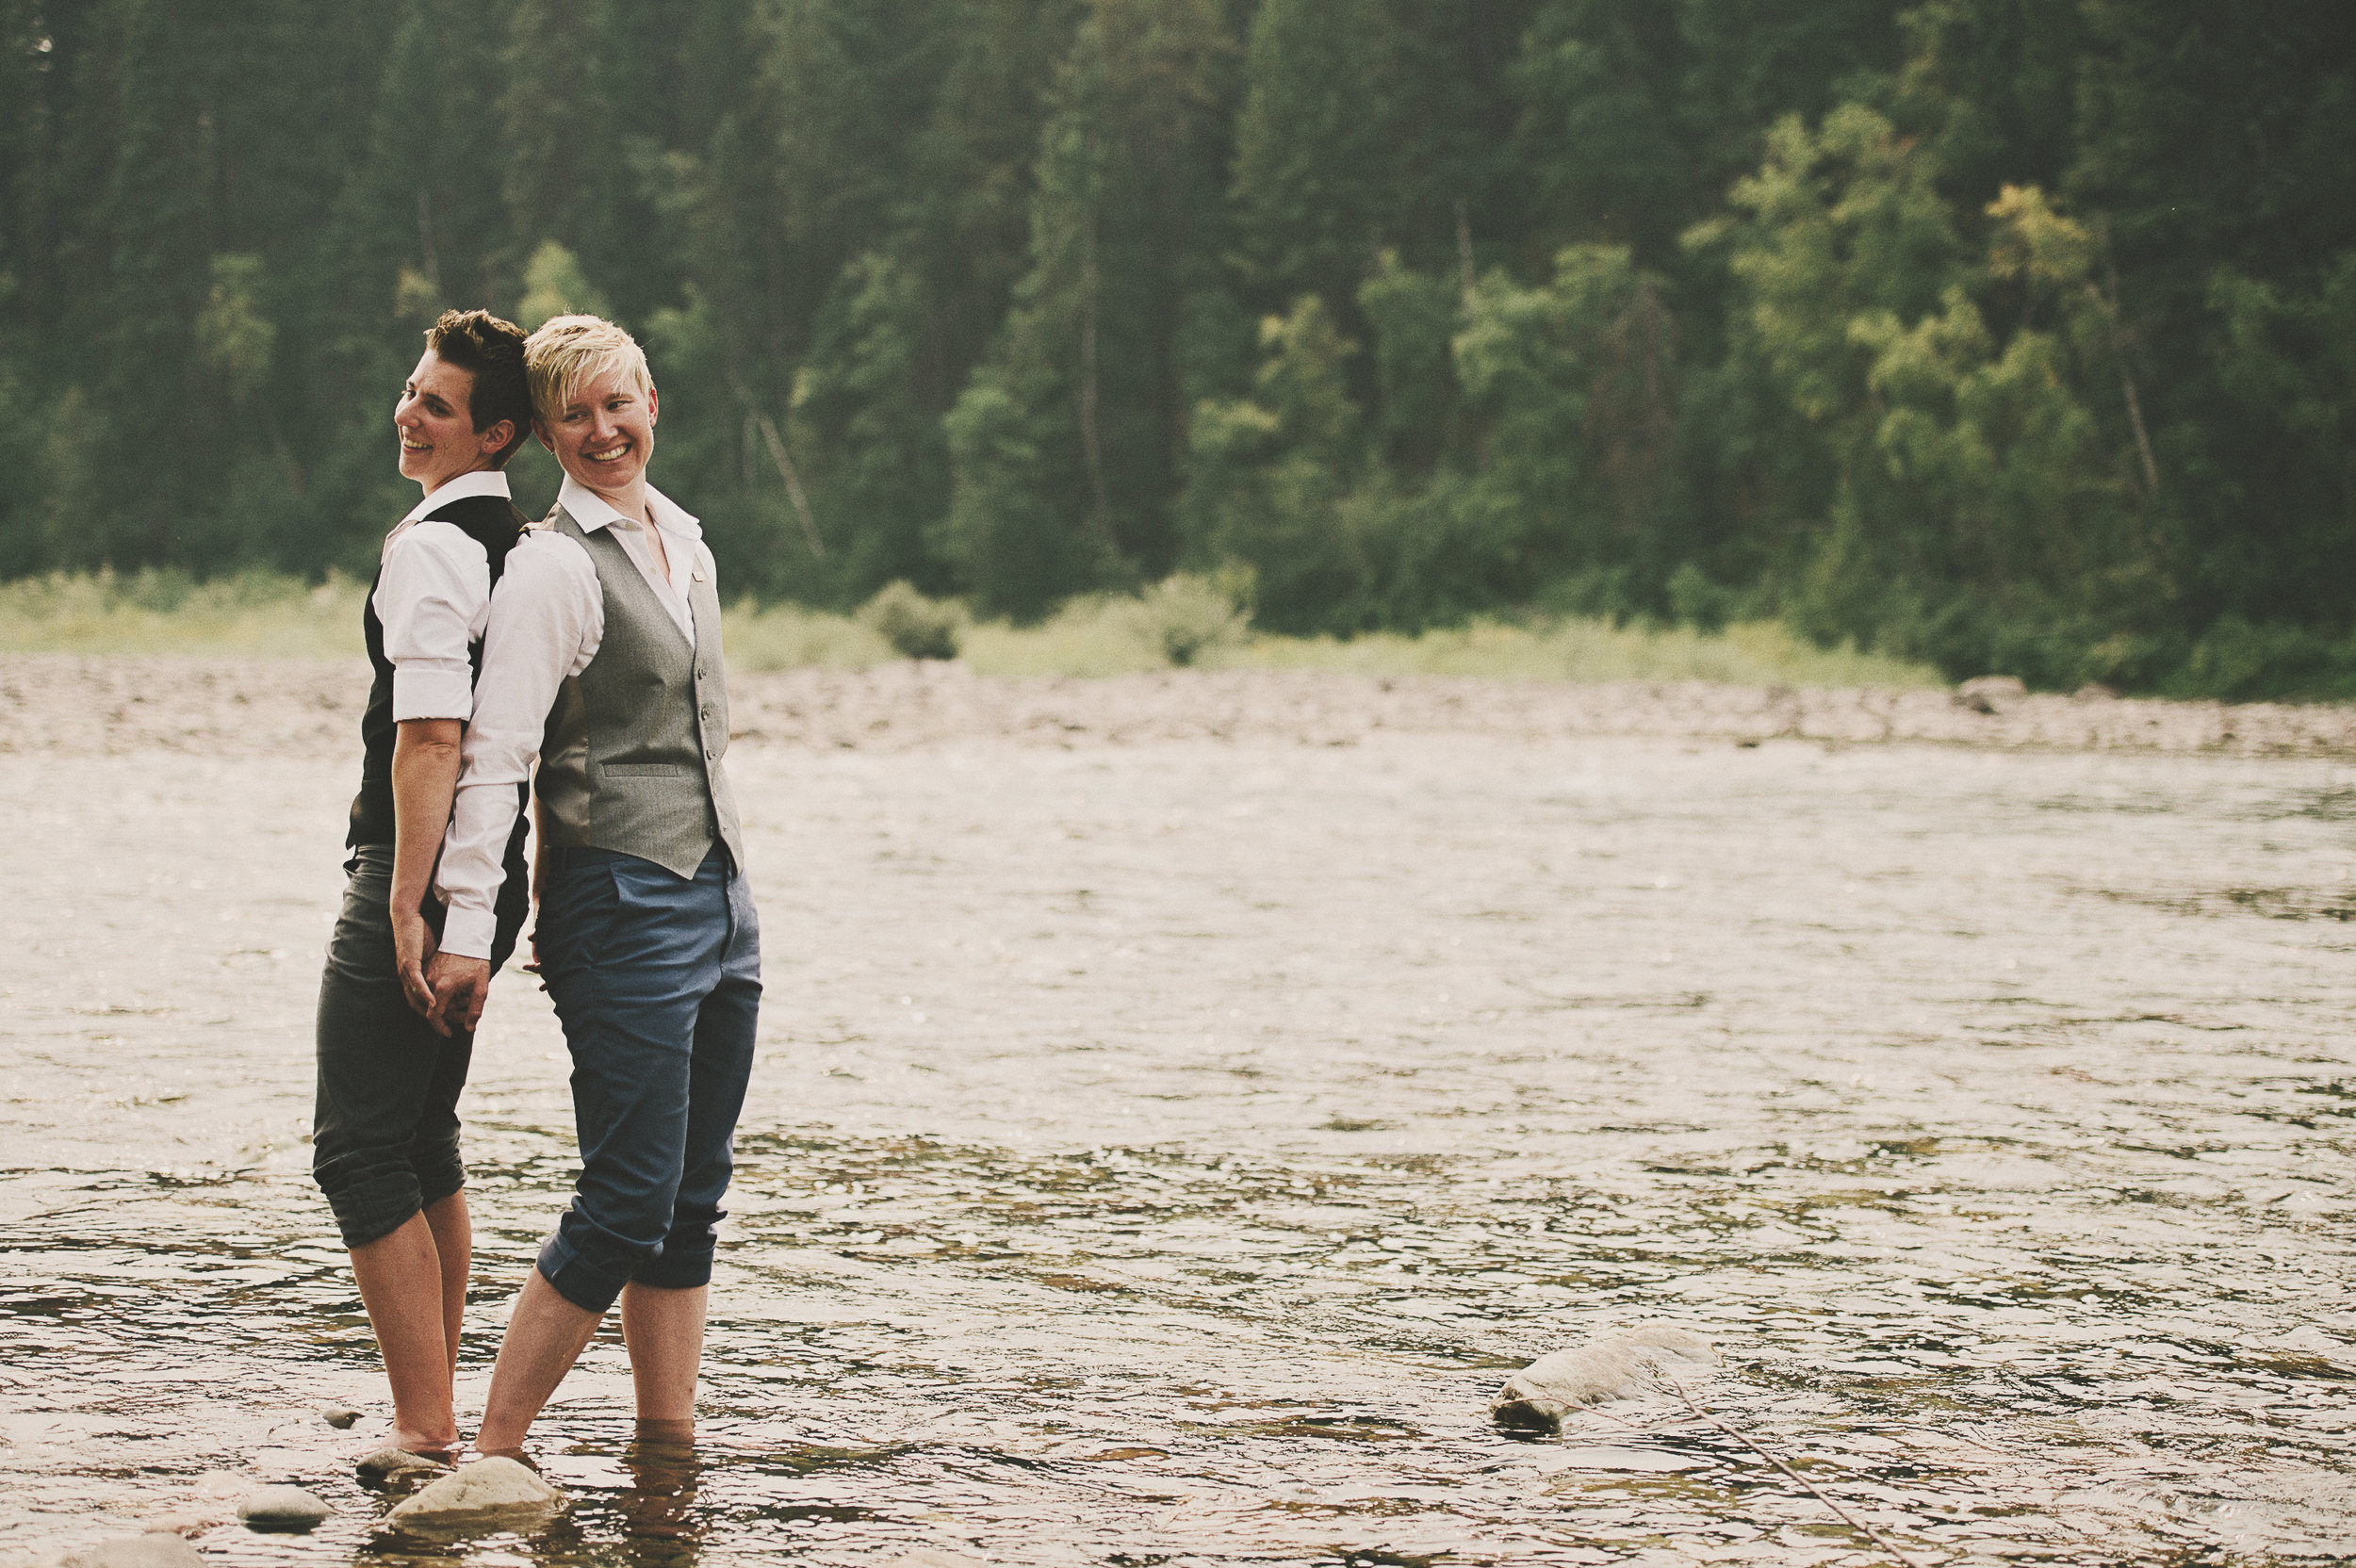 Glacier Montana Wedding_Elly Maurer + Frankie Dashiell Wedding_Beautiful Outdoor Wedding_Kelsey Lane Photography-4790 copy.jpg